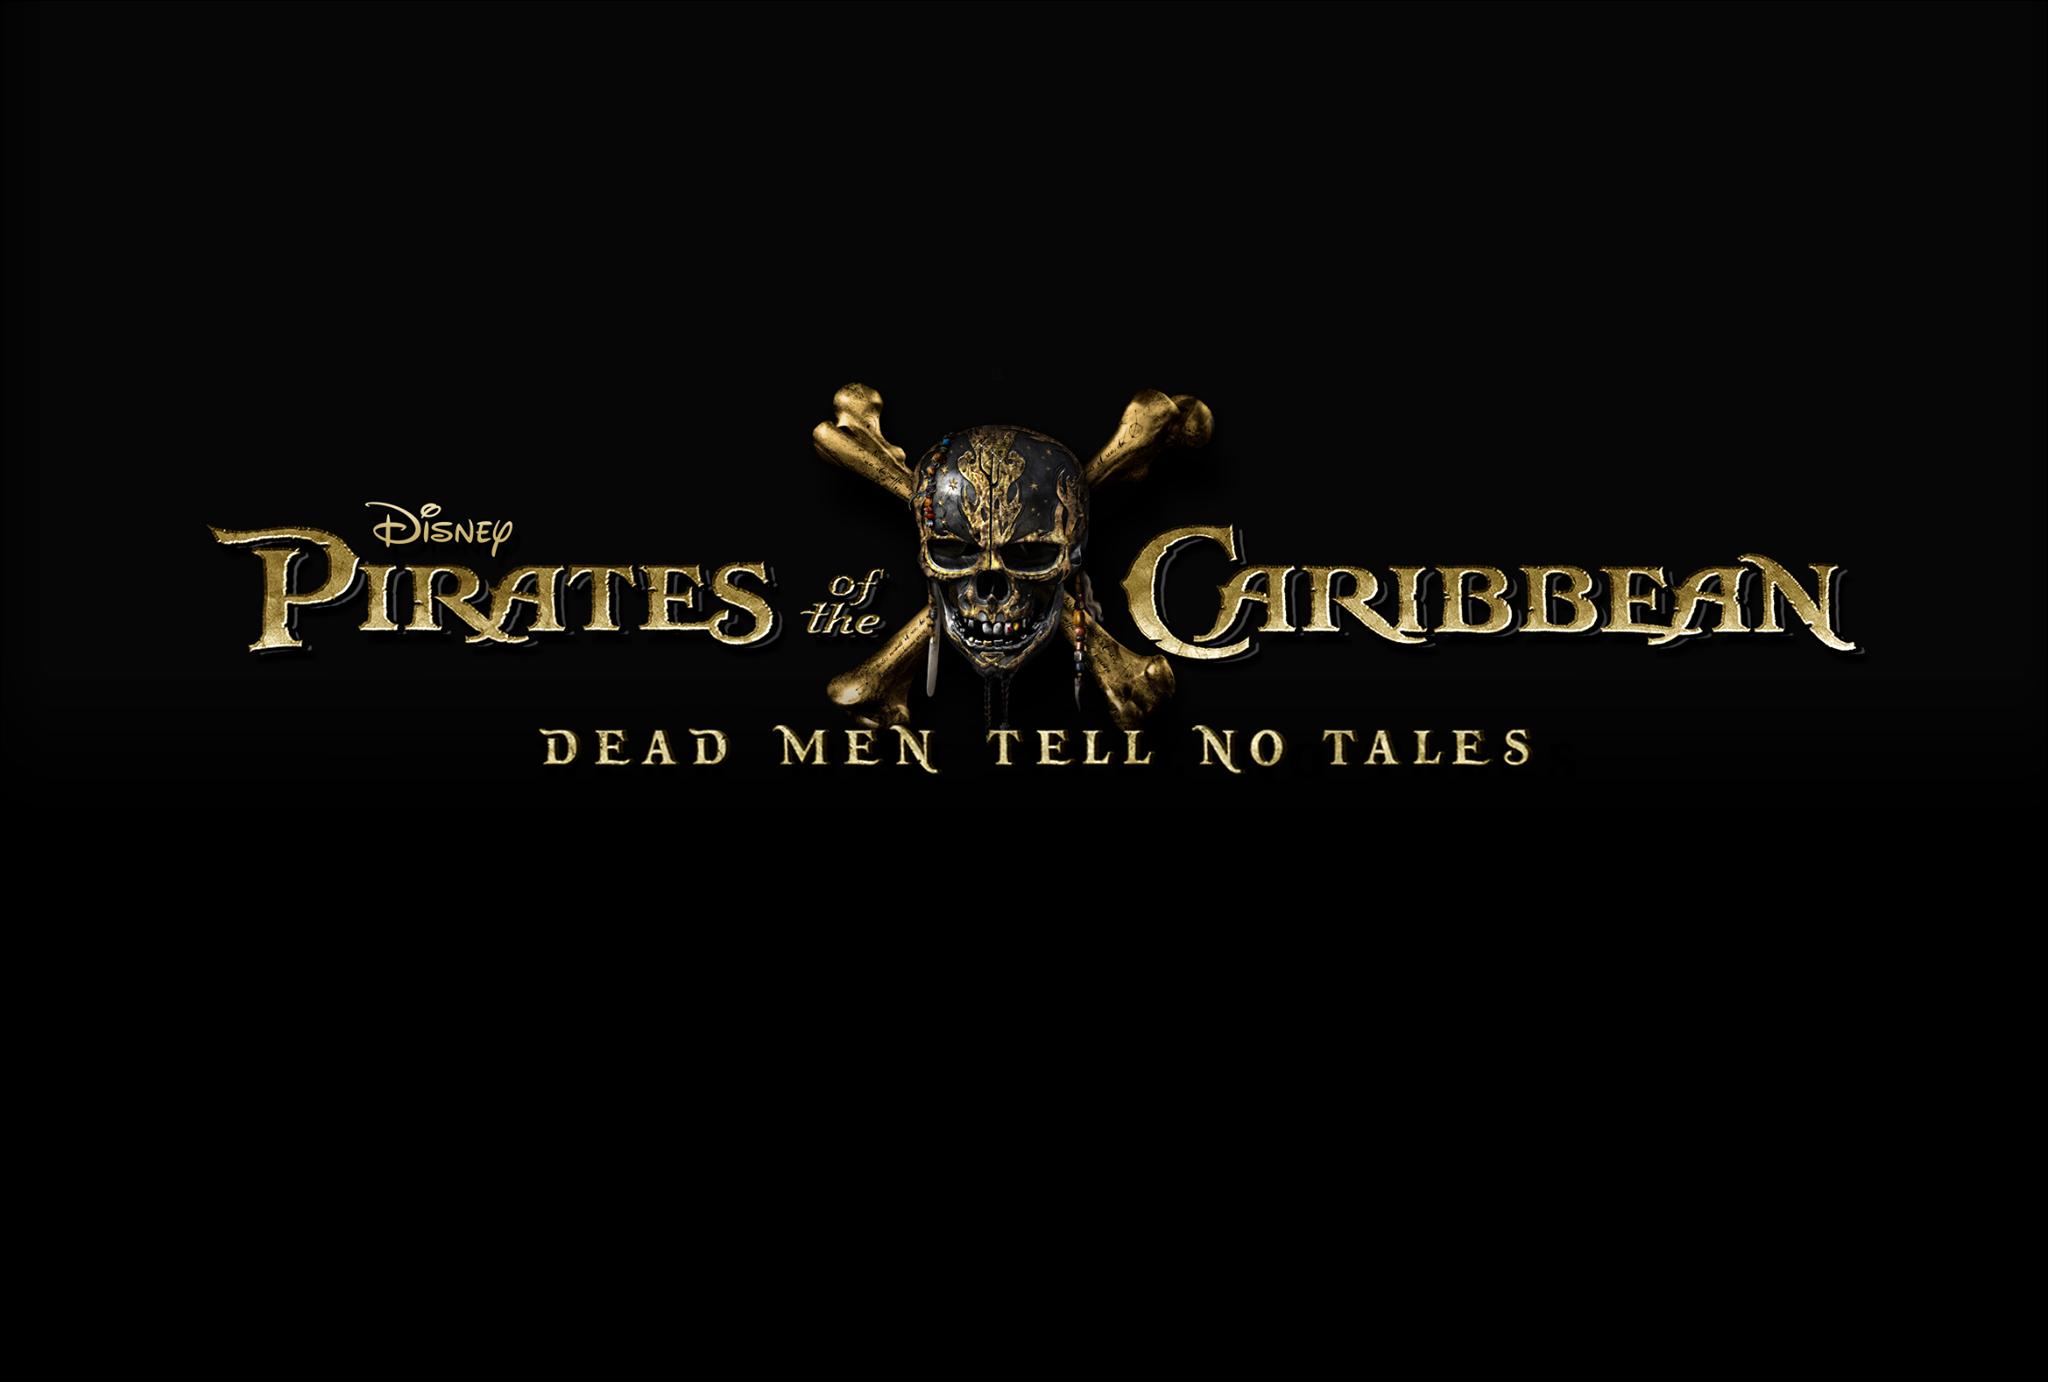 Pirates Of The Caribbean Dead Men Tell No Tales Wallpaper